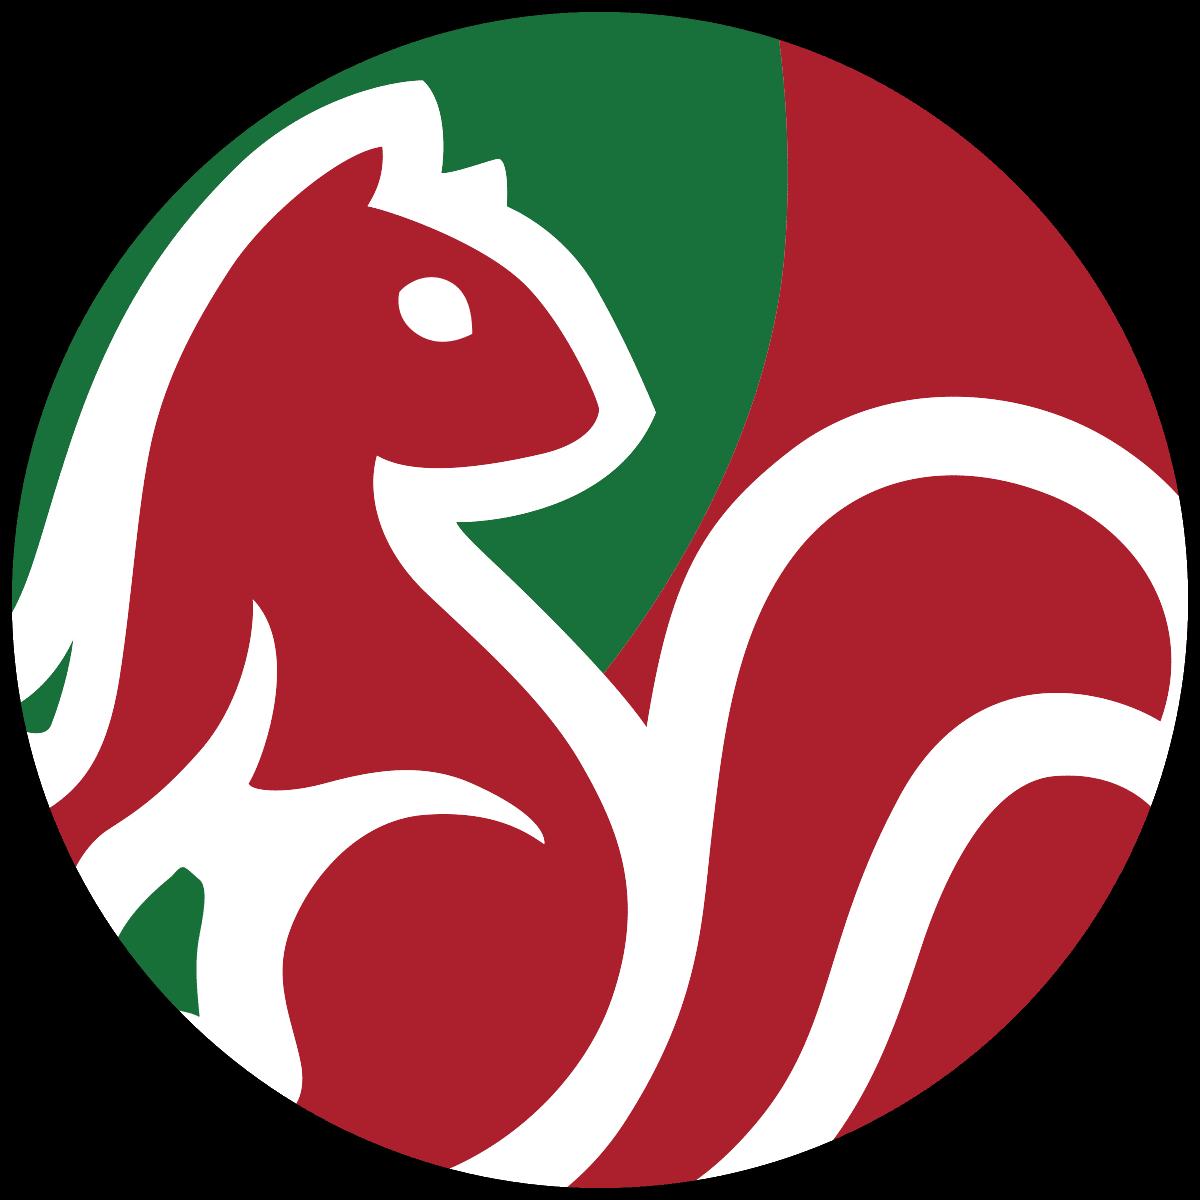 https://wilmslowcricketclub.com/wp-content/uploads/2020/02/WCC-Circle-Logo-Brand.png